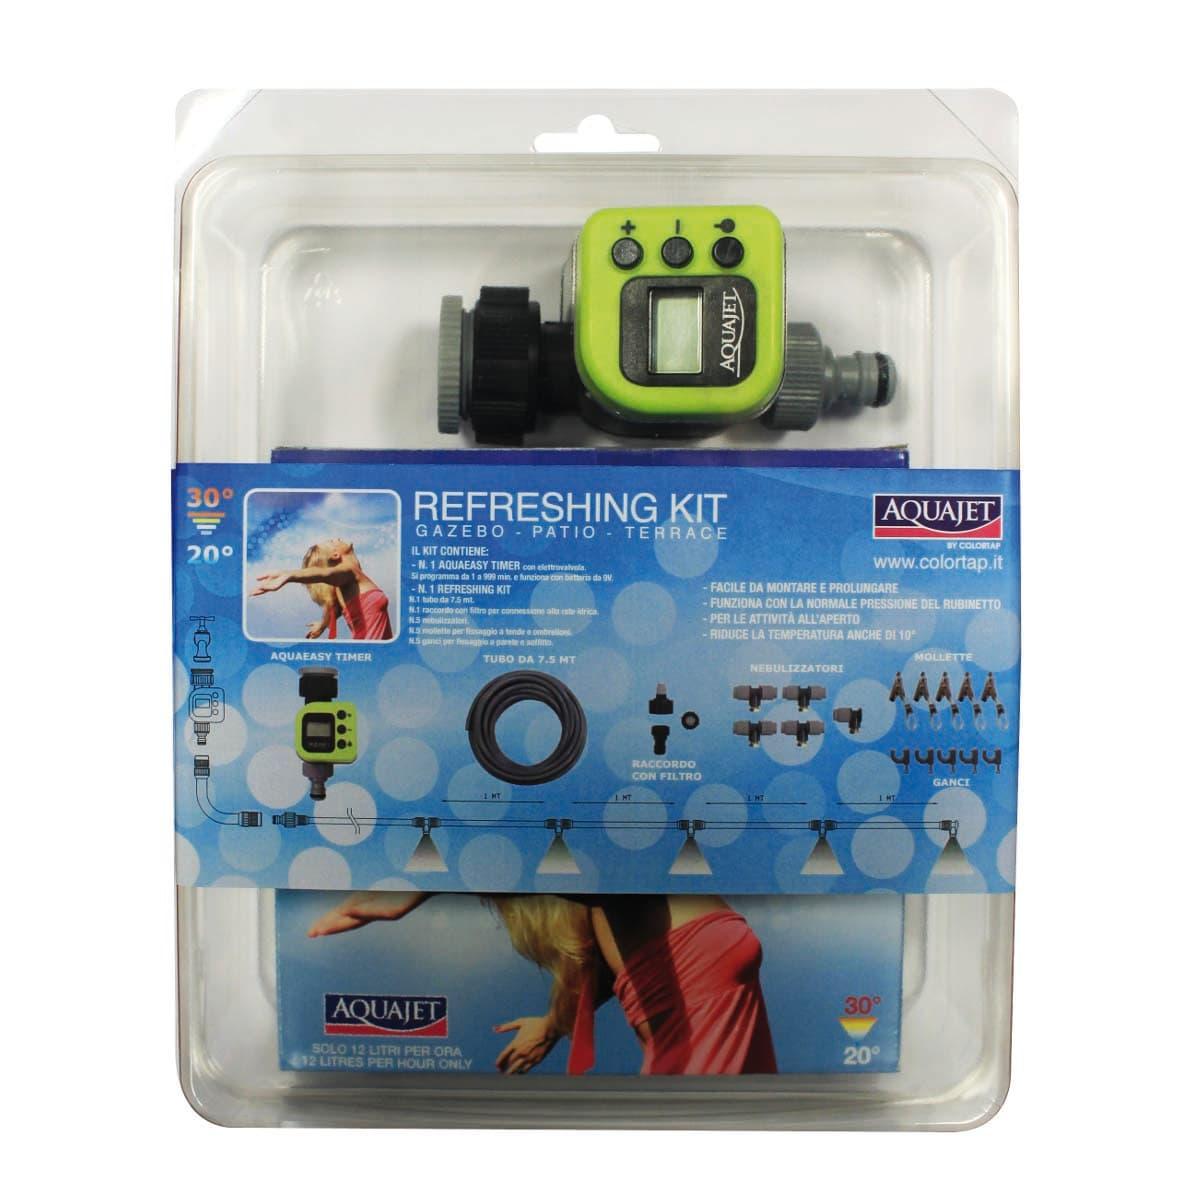 Kit Nebulizzazione Timer Aquajet Prezzi E Offerte Online Leroy Merlin